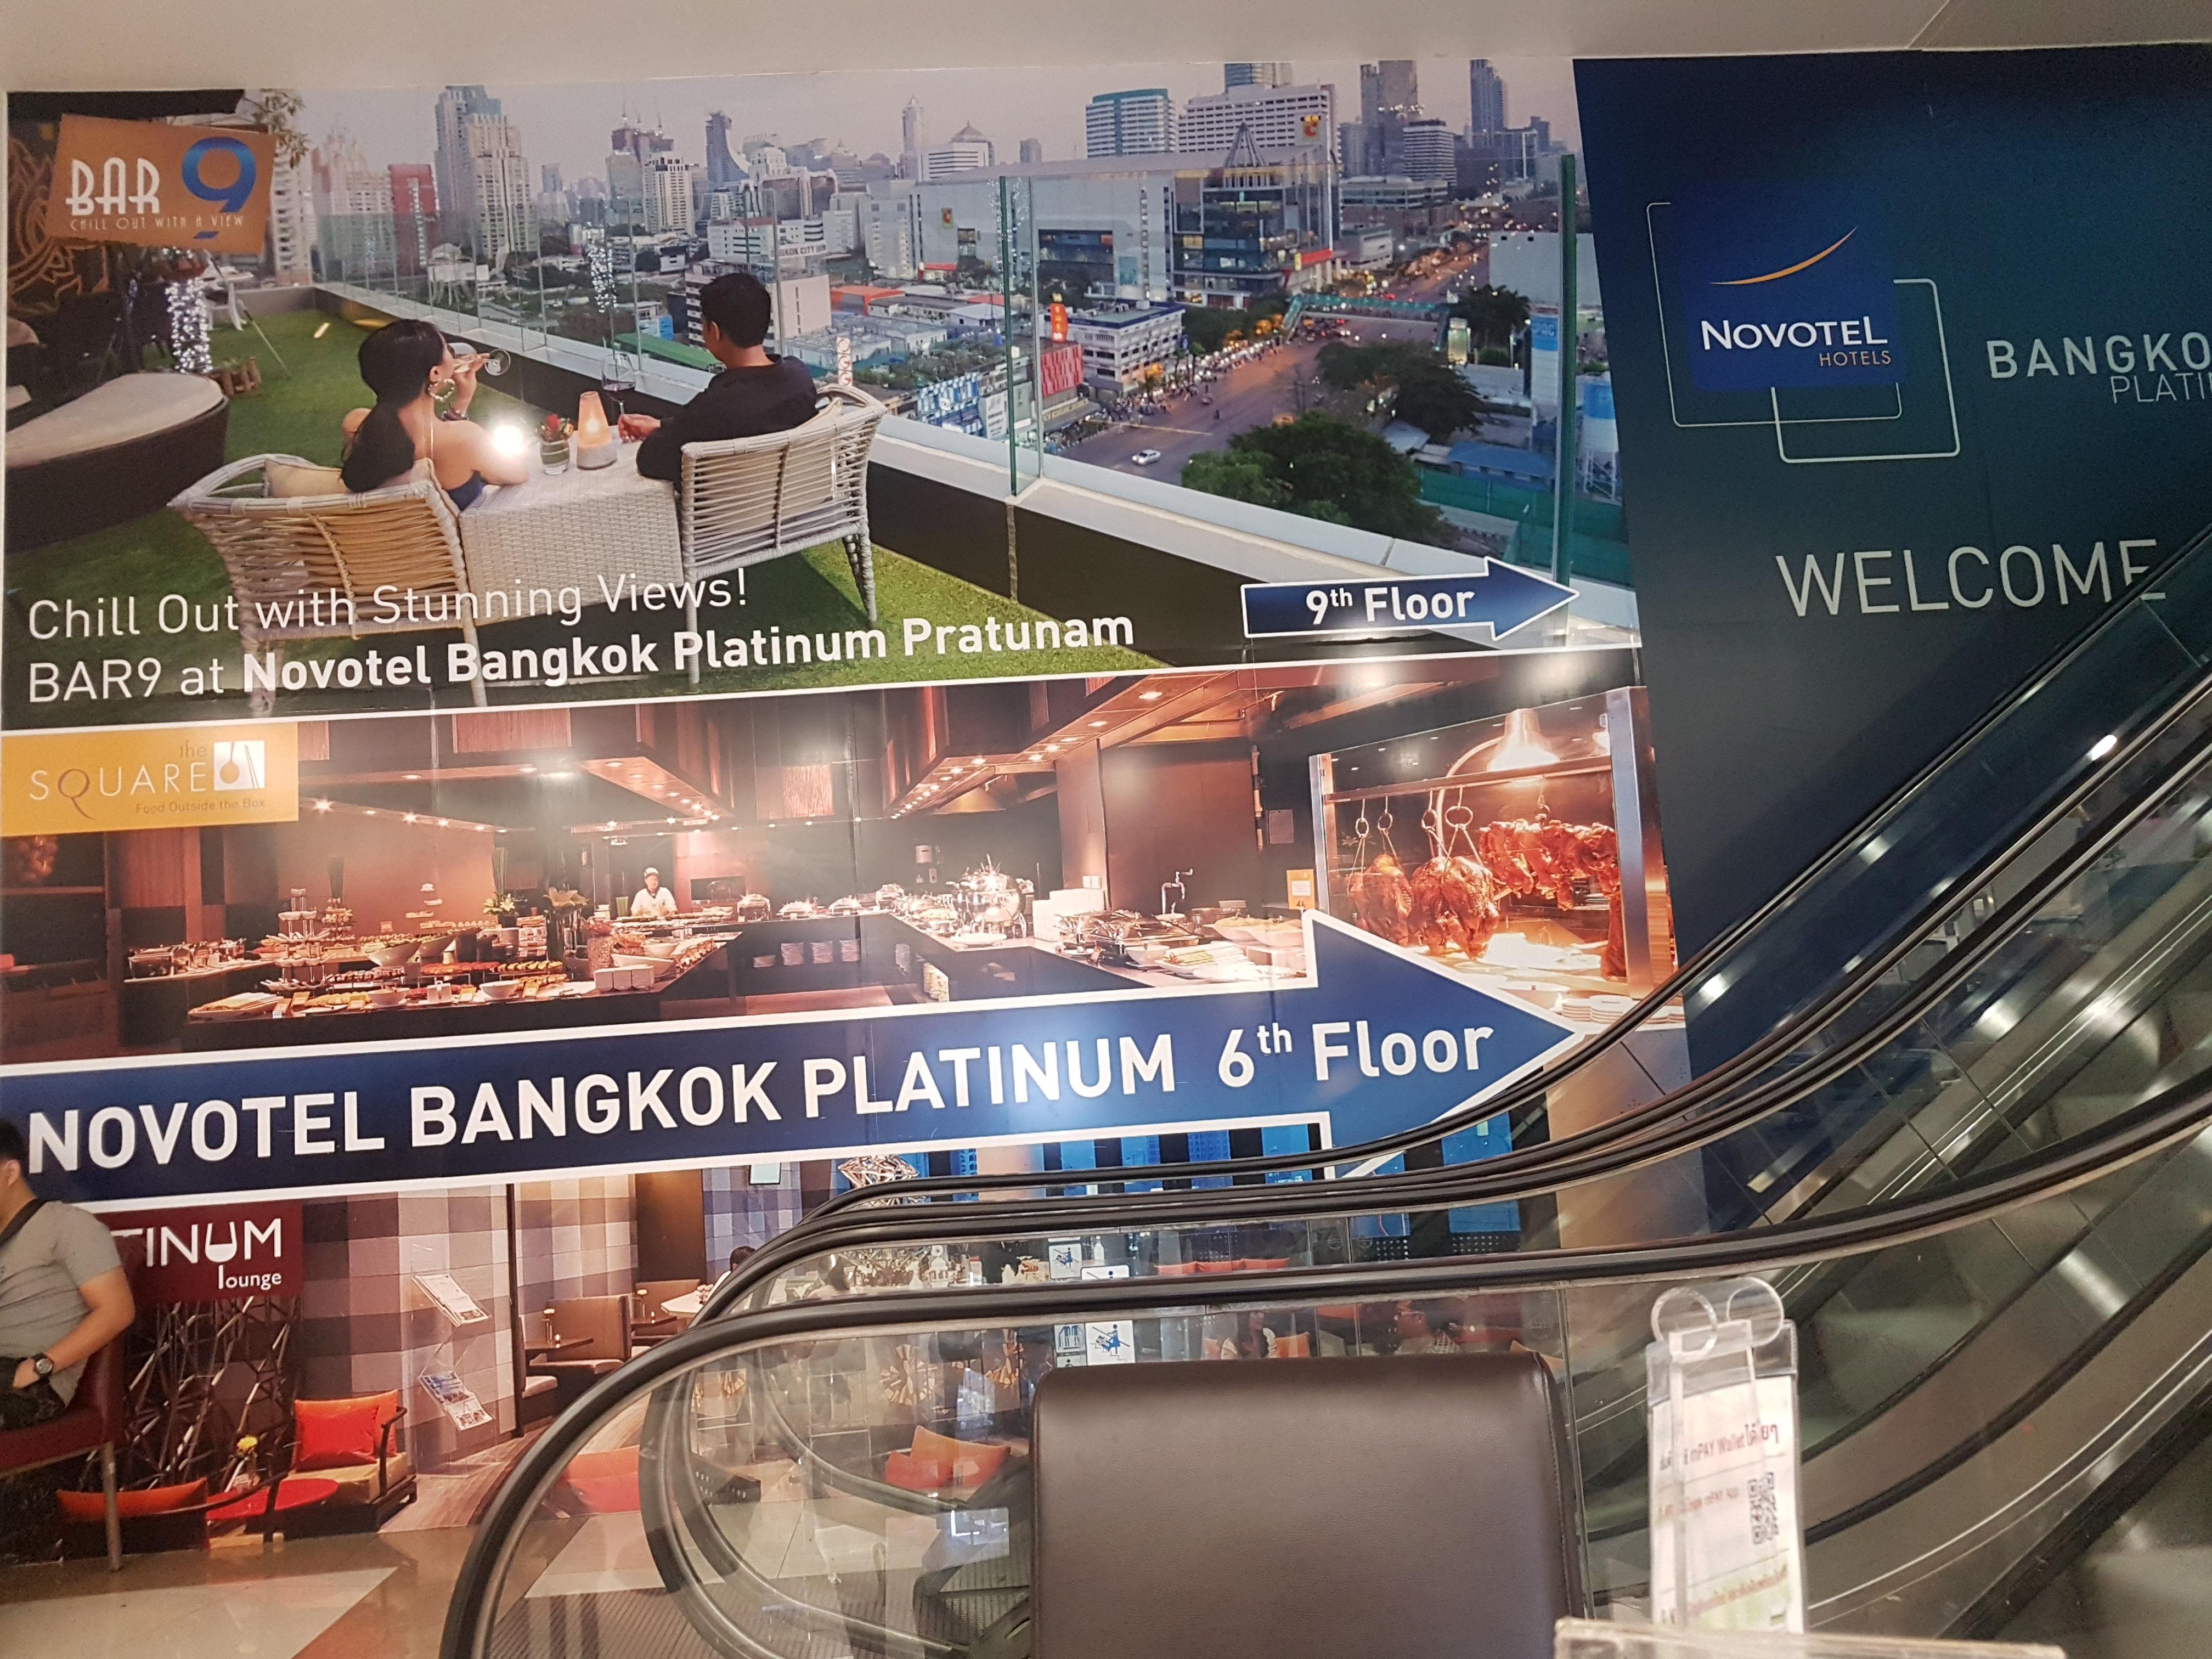 Novotel Bangkok